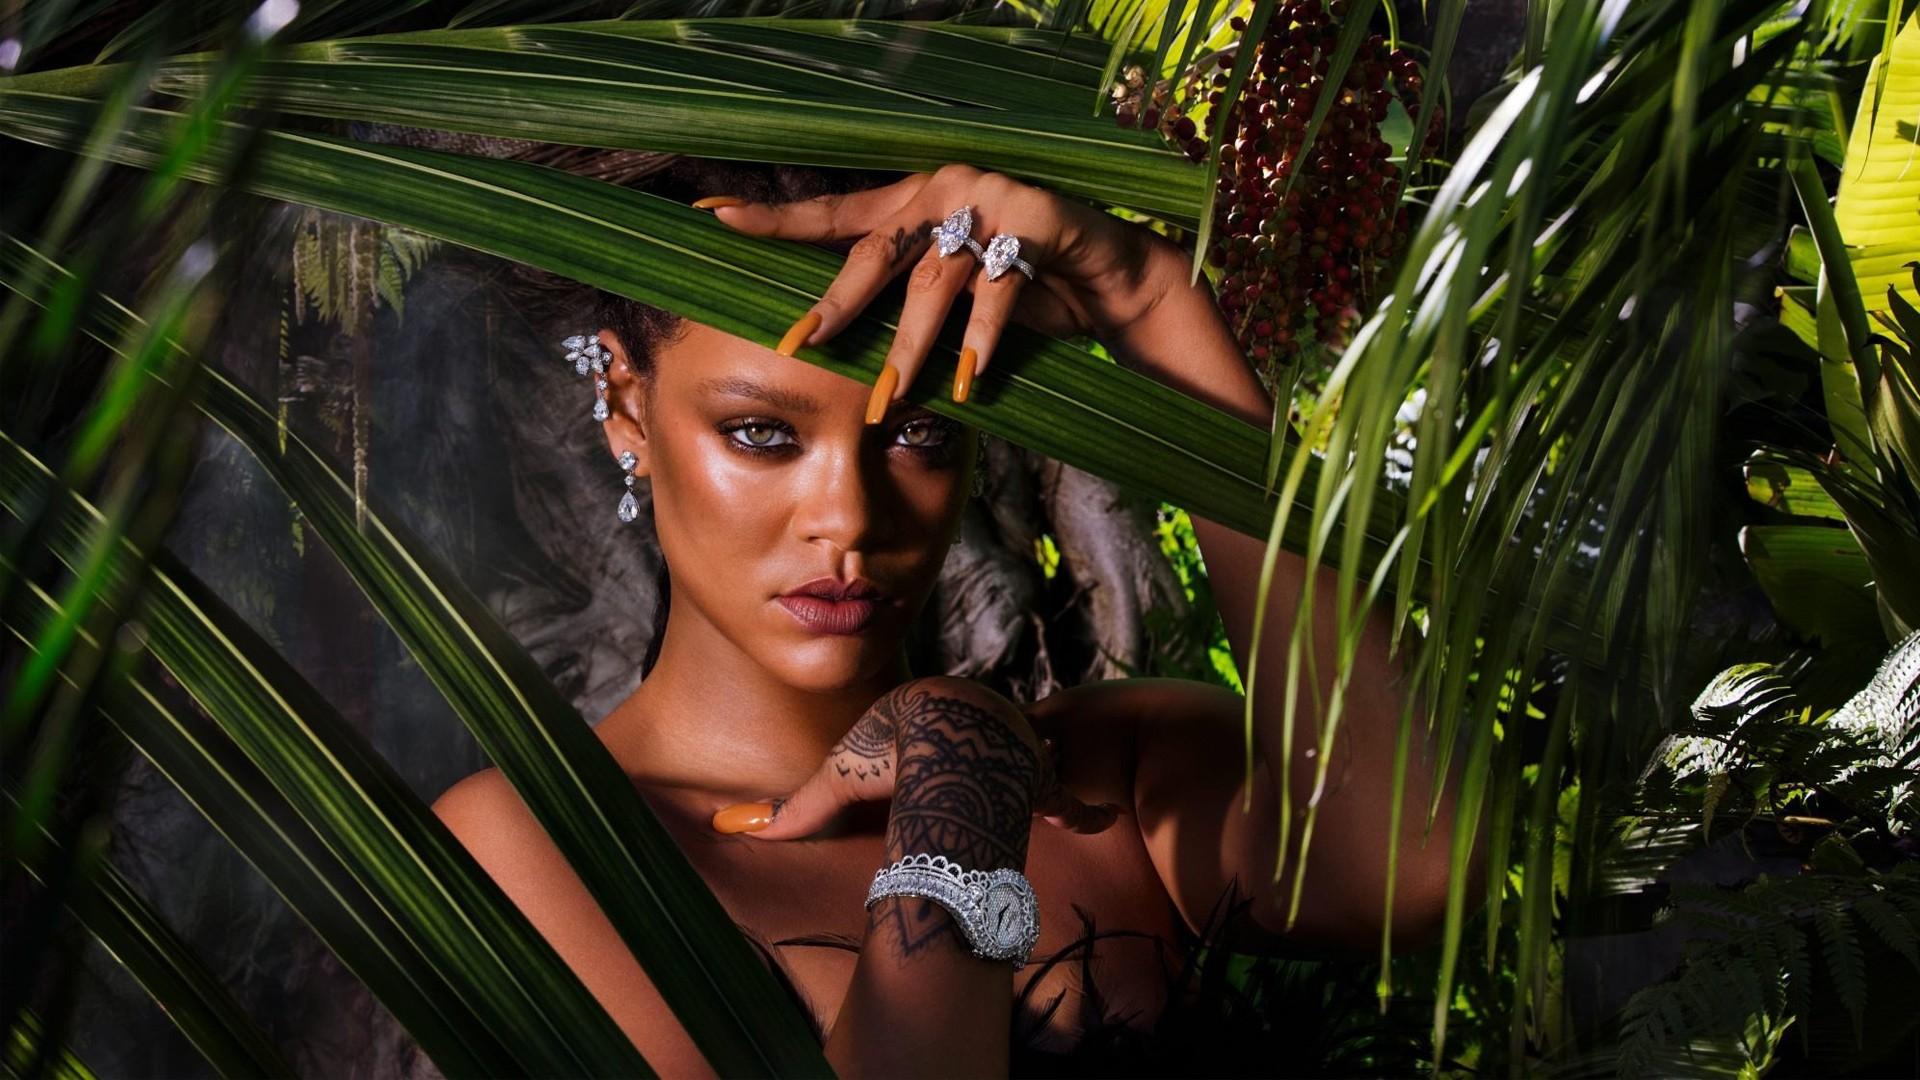 Love Wallpaper Iphone X Rihanna 2017 Hd Wallpapers Hd Wallpapers Id 21275